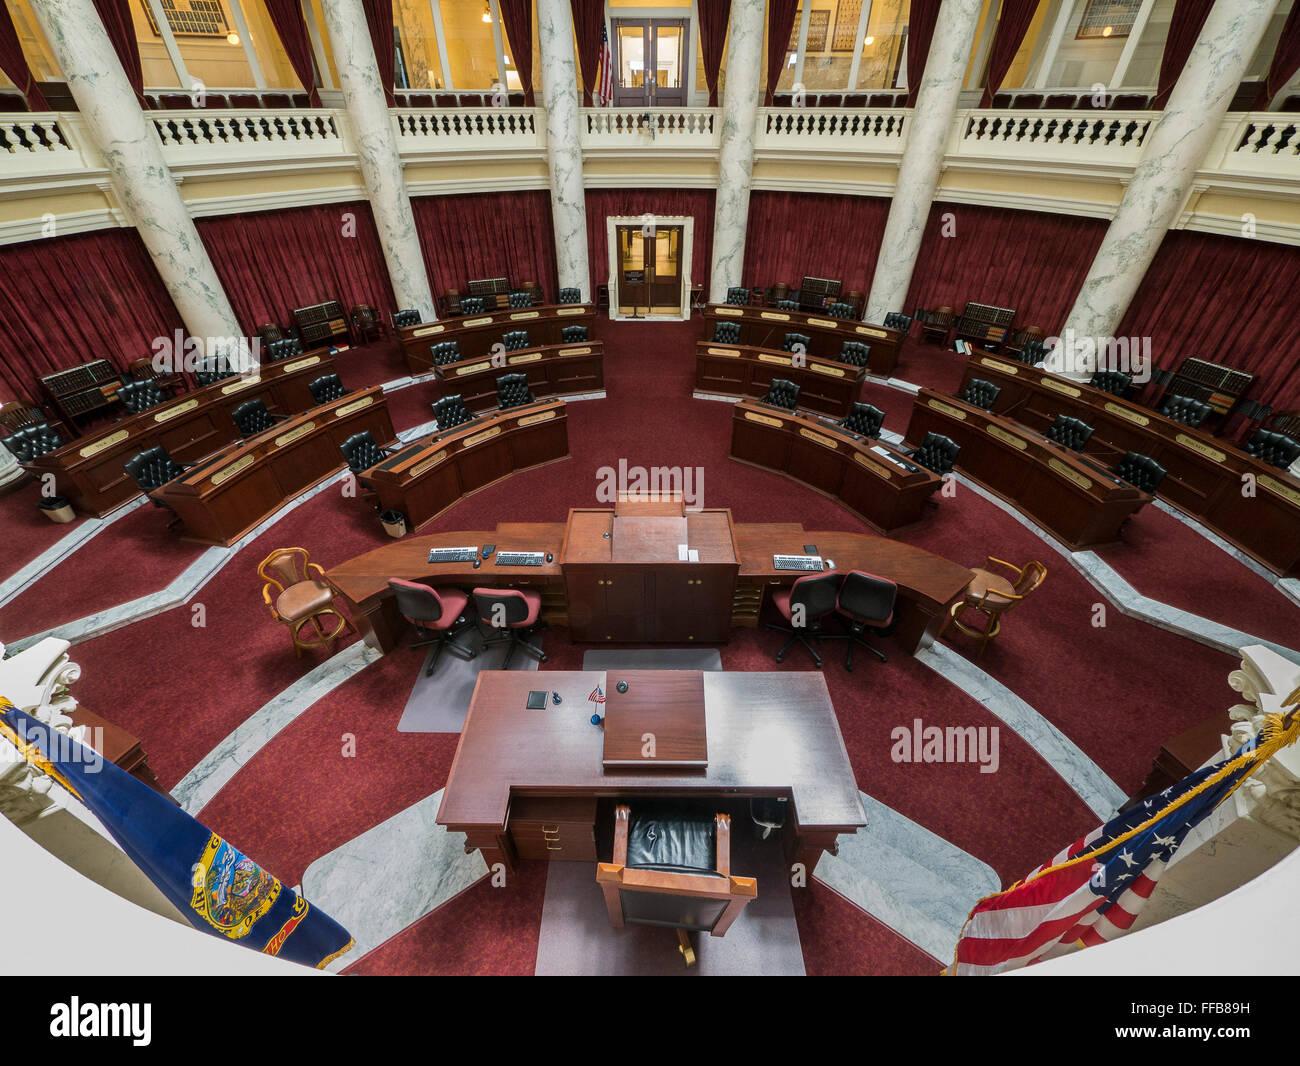 Senate chambers, Idaho State Capitol building, Boise, Idaho. - Stock Image